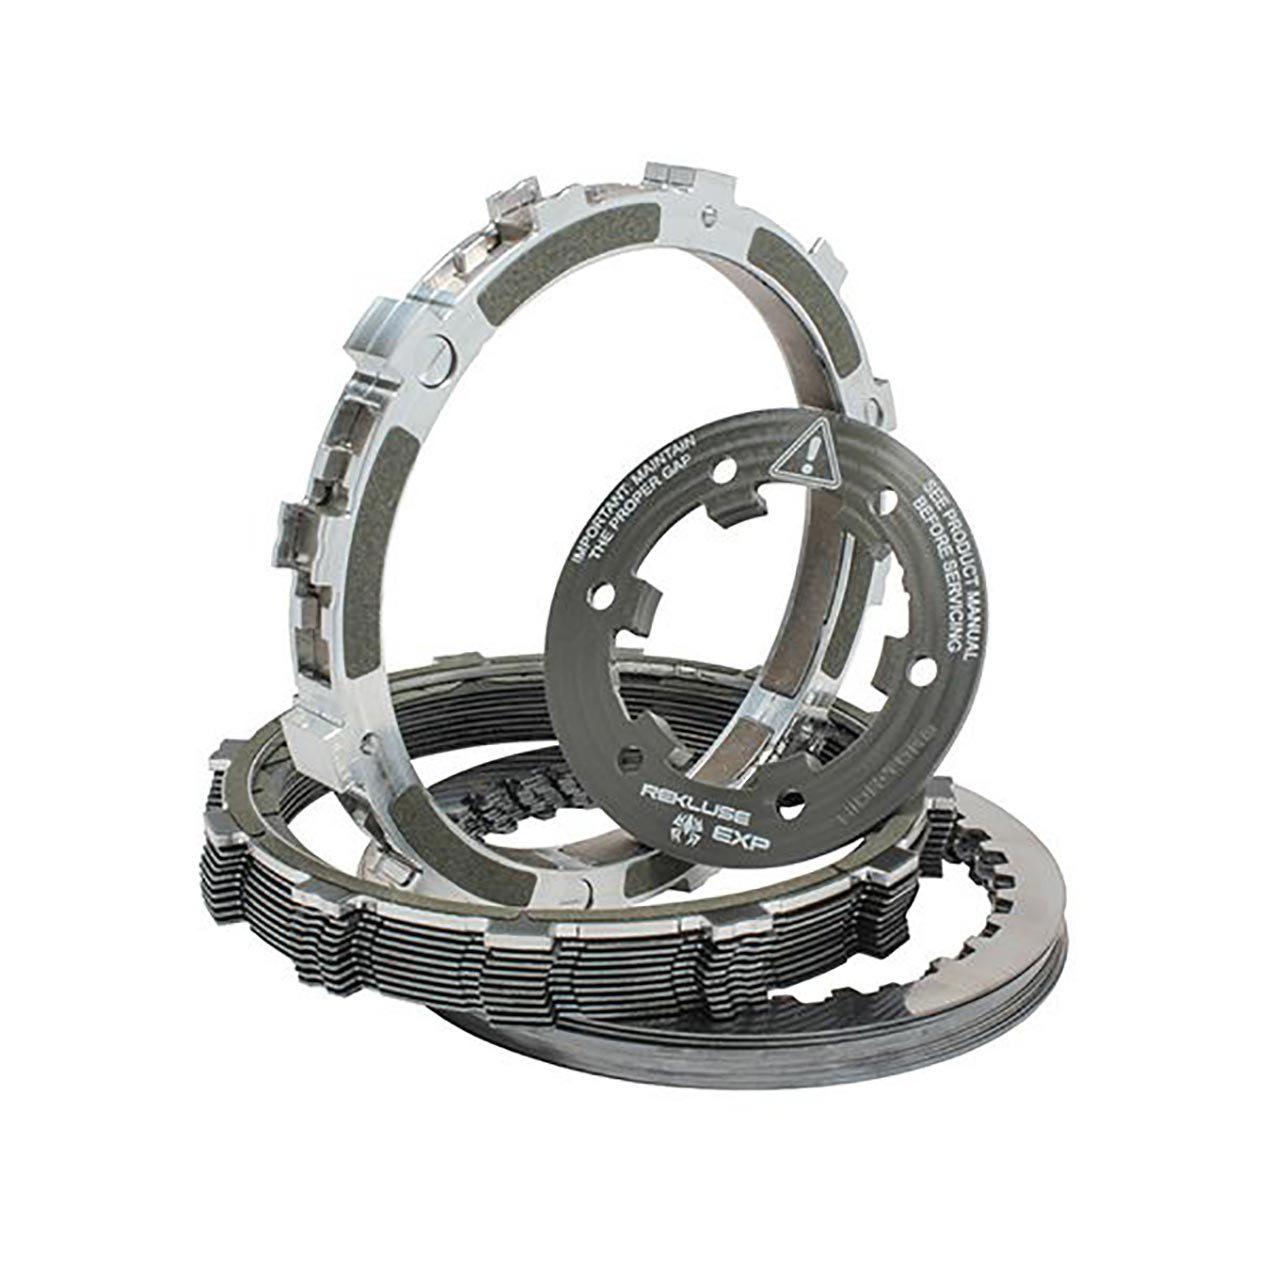 rekluse-radius-EXP-clutch.jpg